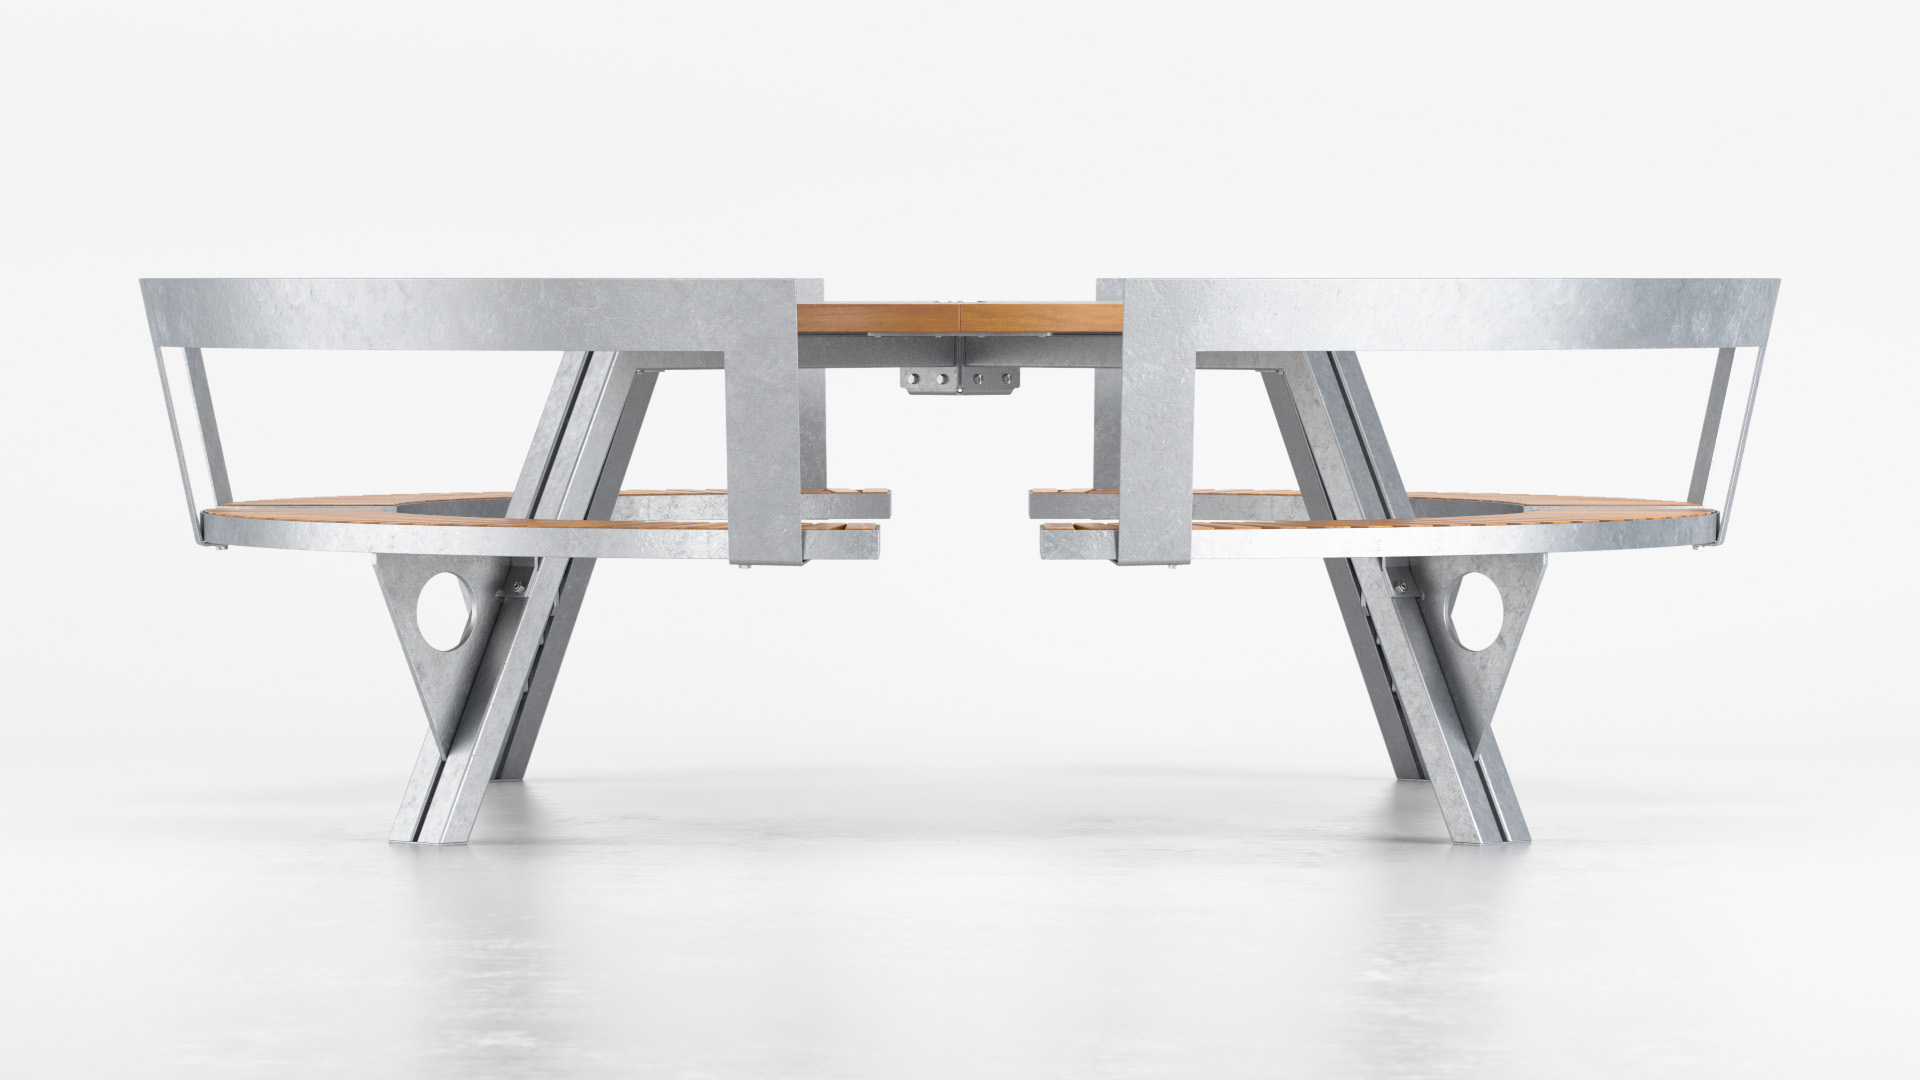 Gargantua_Table_Mode3_WhiteSet_01_0002